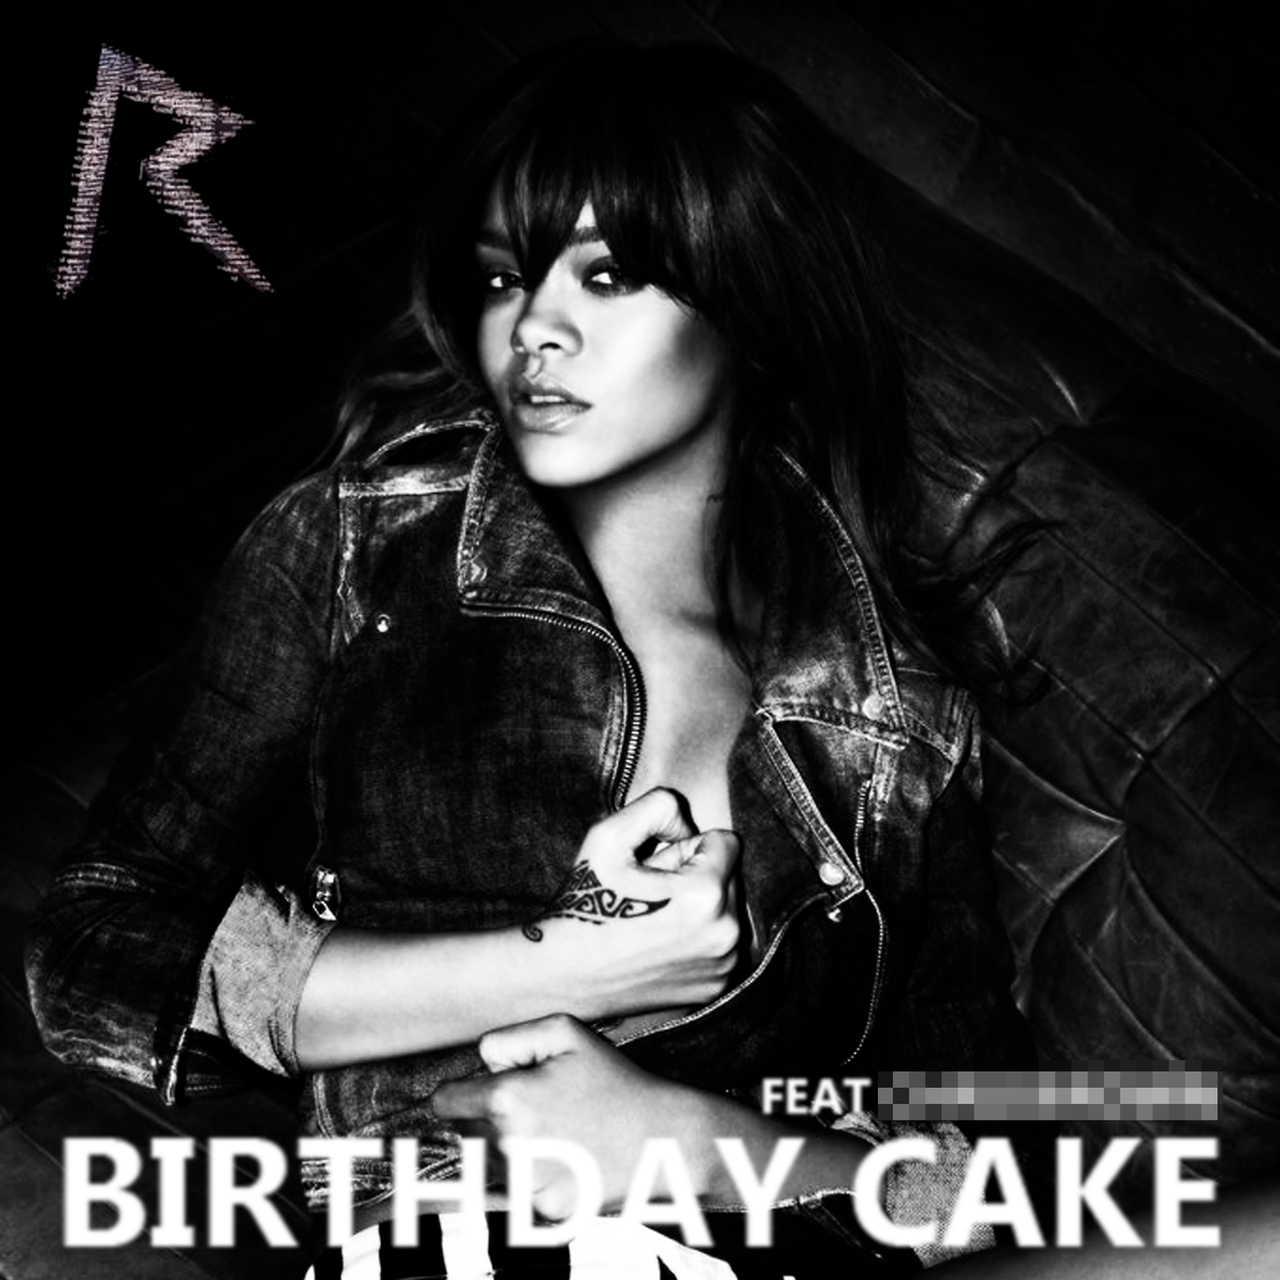 Rihanna Birthday Cake Alternative Cover By Leonardomatheus On